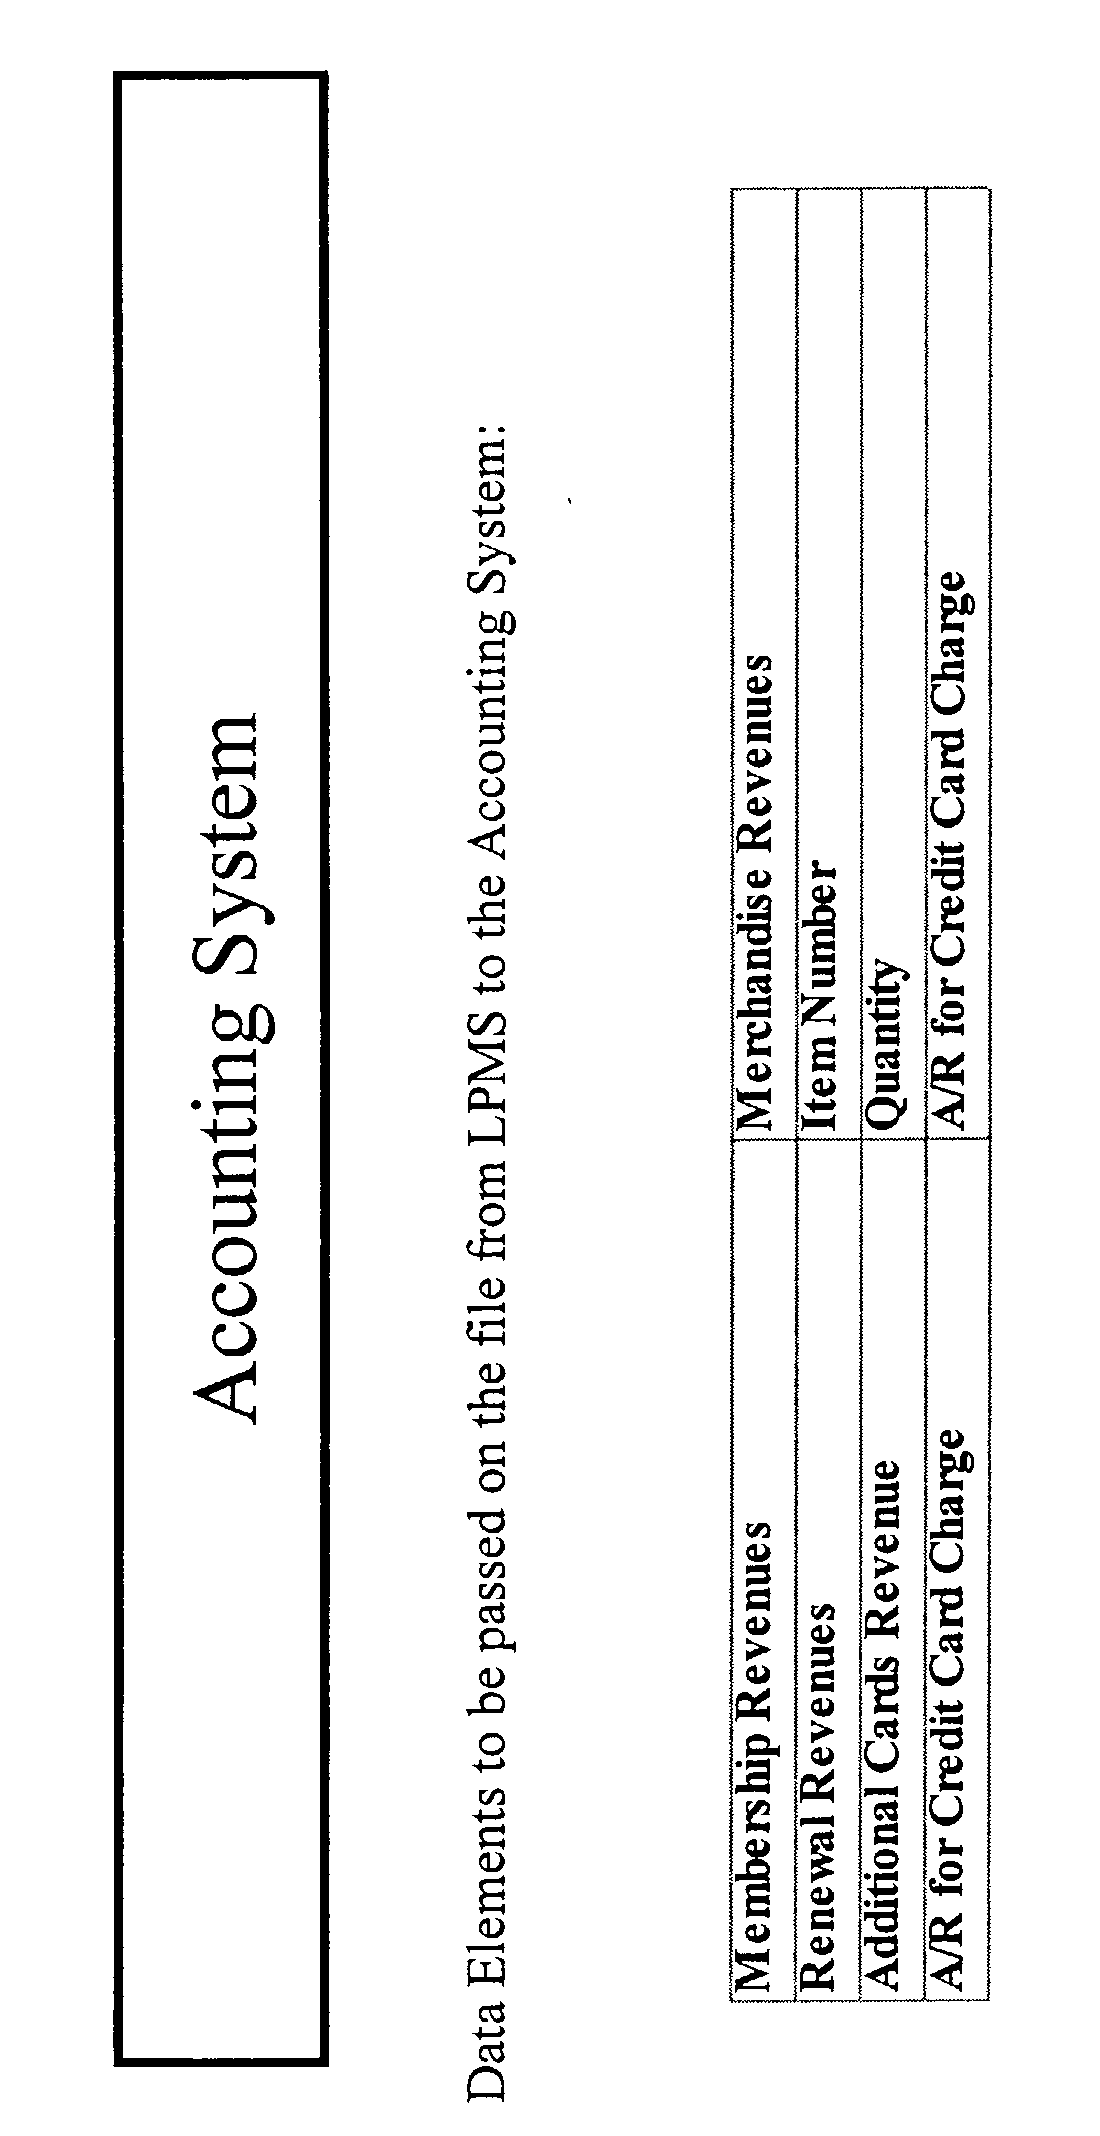 Figure US20030023491A1-20030130-P00083